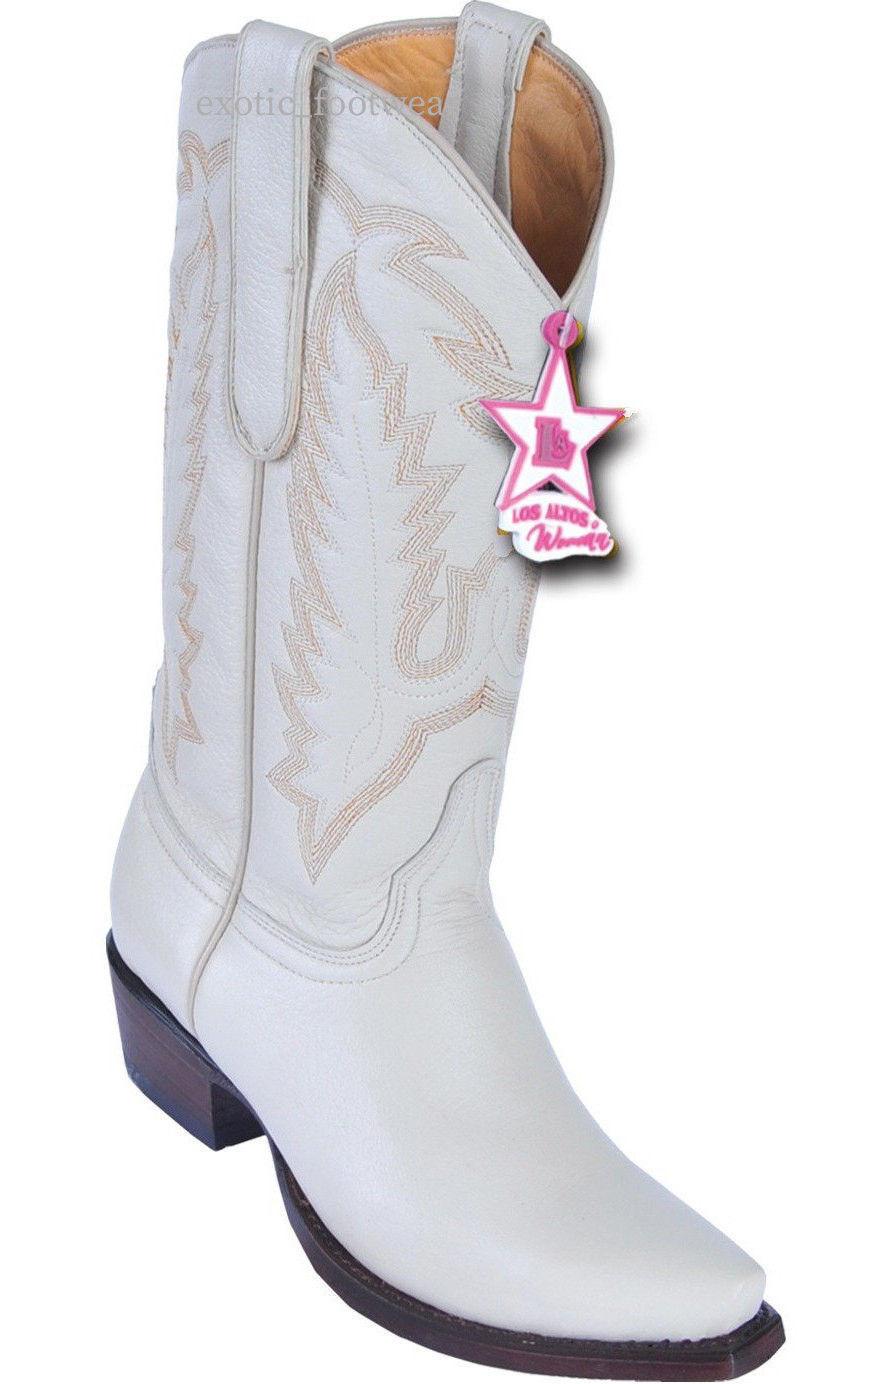 WOMEN LOS ALTOS WINTER WHITE (CREAM) GENUINE DEER SNIP TOE WESTERN COWBOY BOOT